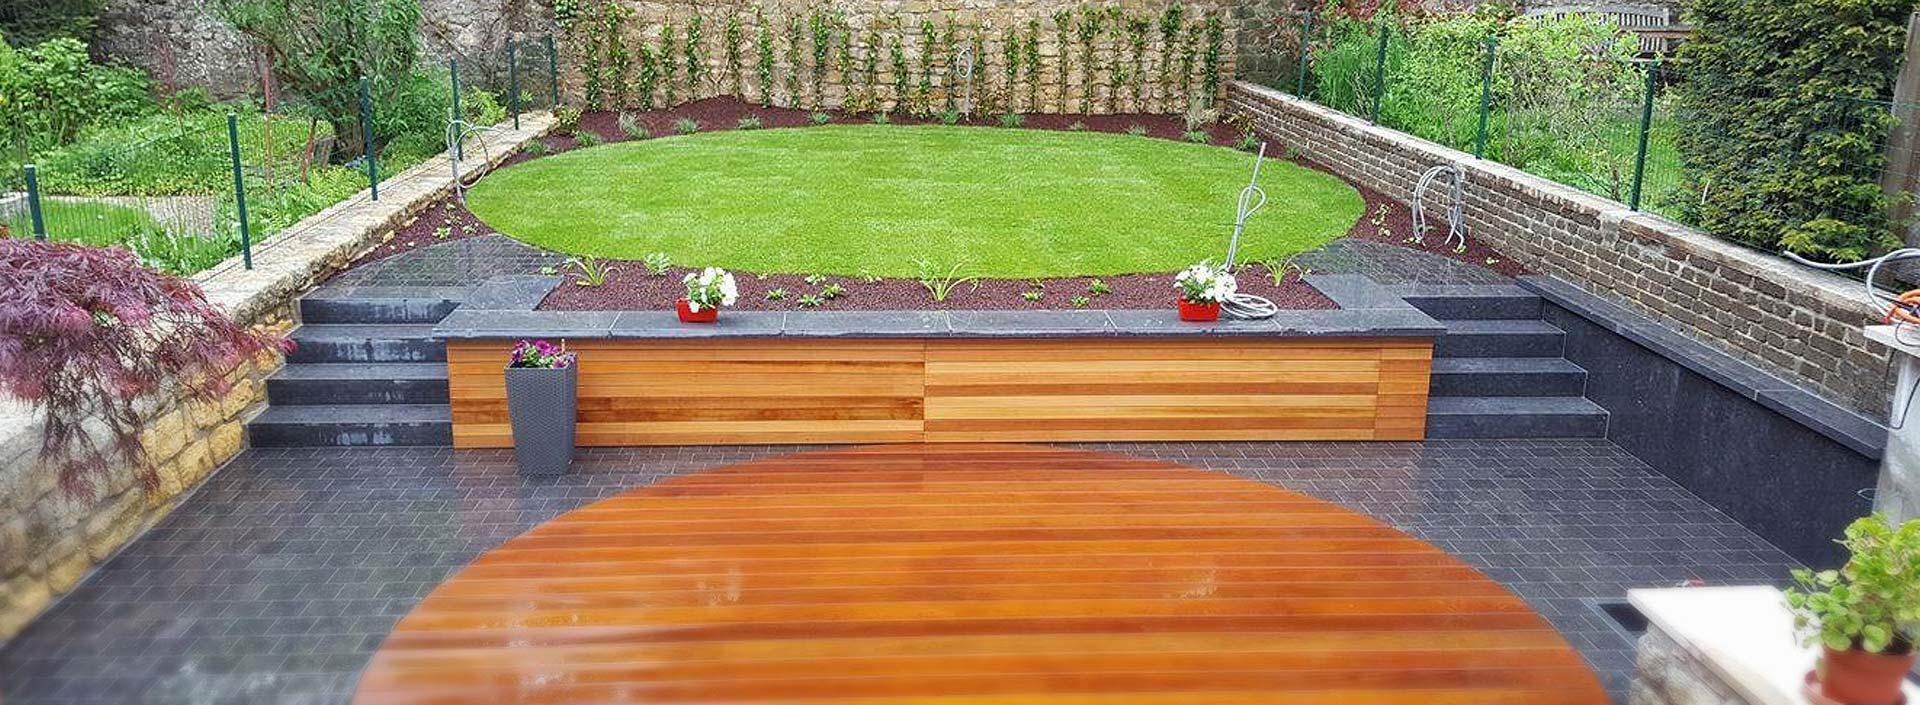 paysagiste-luxembourg-entretien-jardin-terrasse